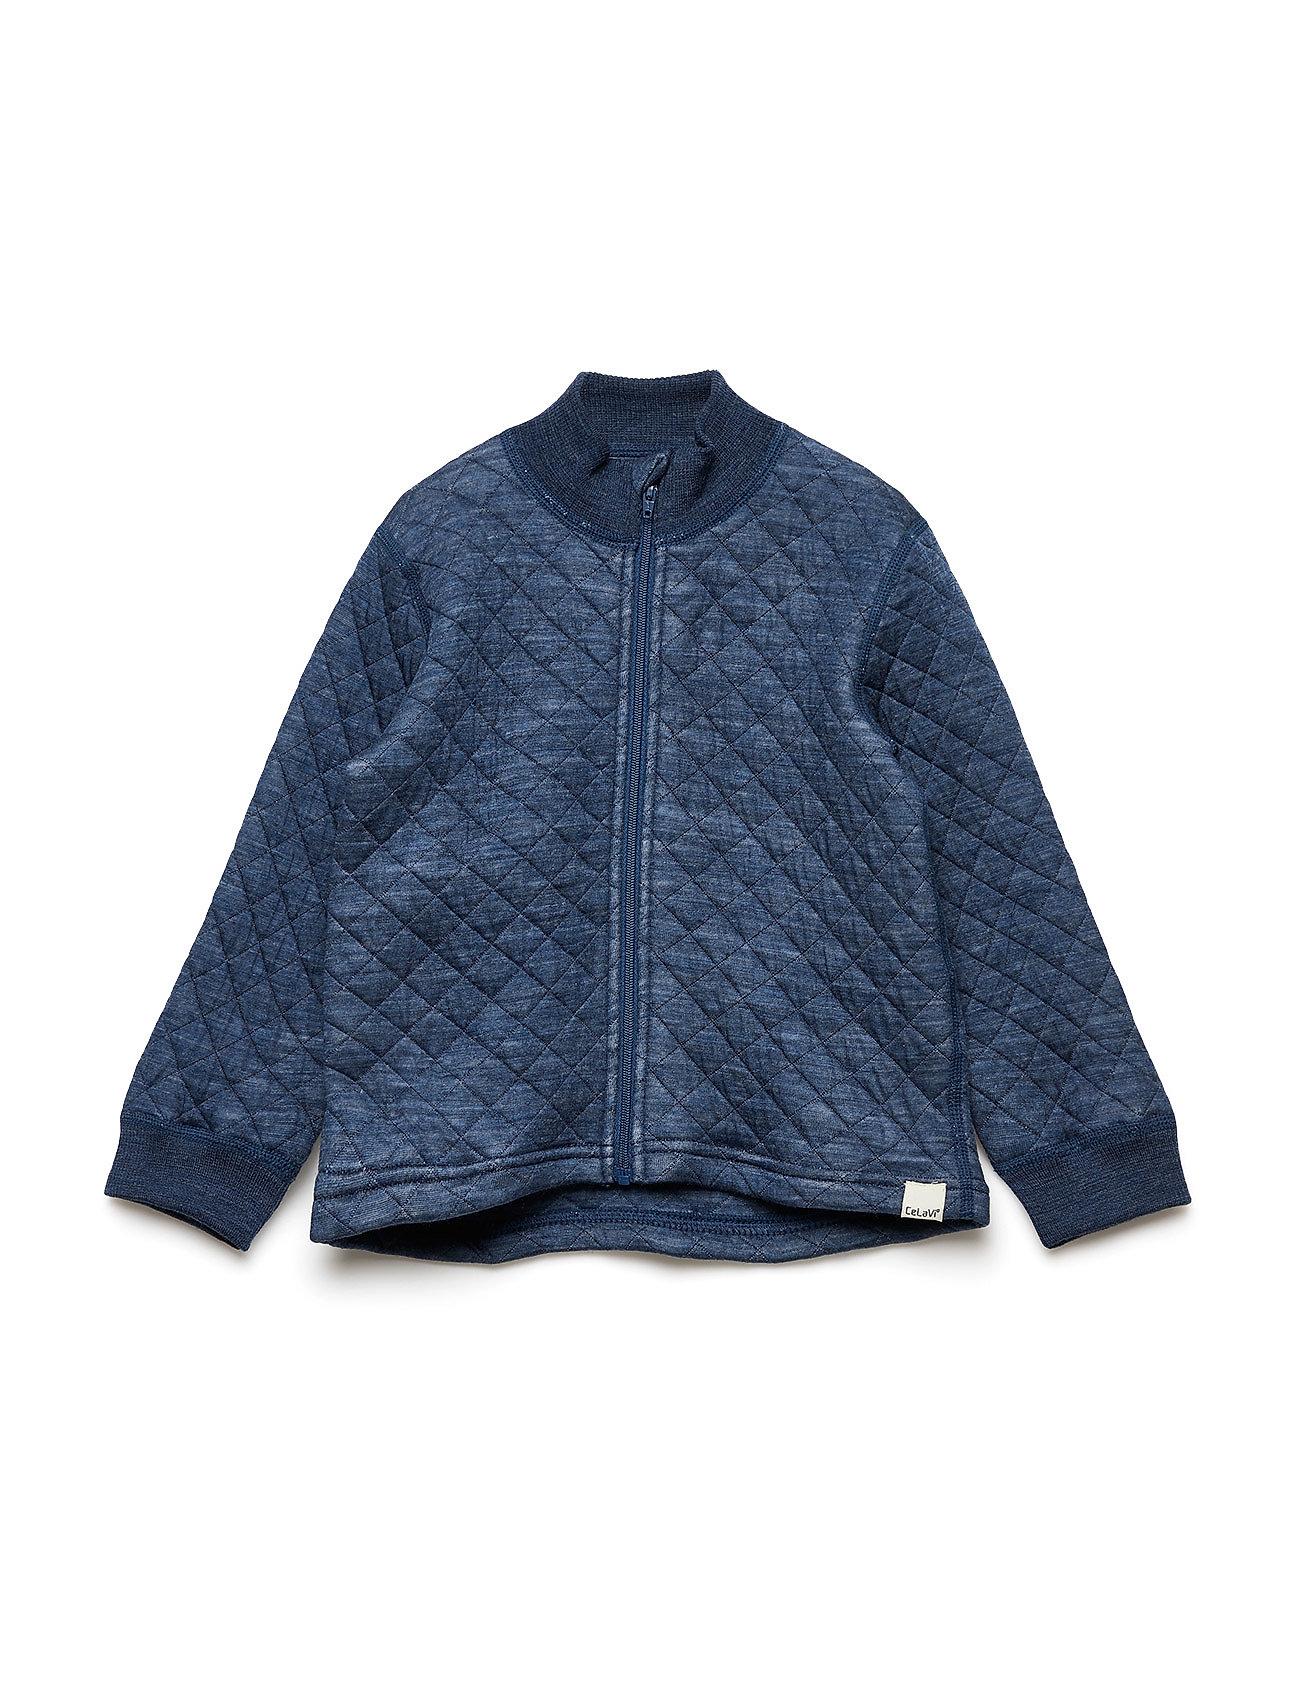 CeLaVi Jacket LS Wonder wollies - ENSIGN BLUE